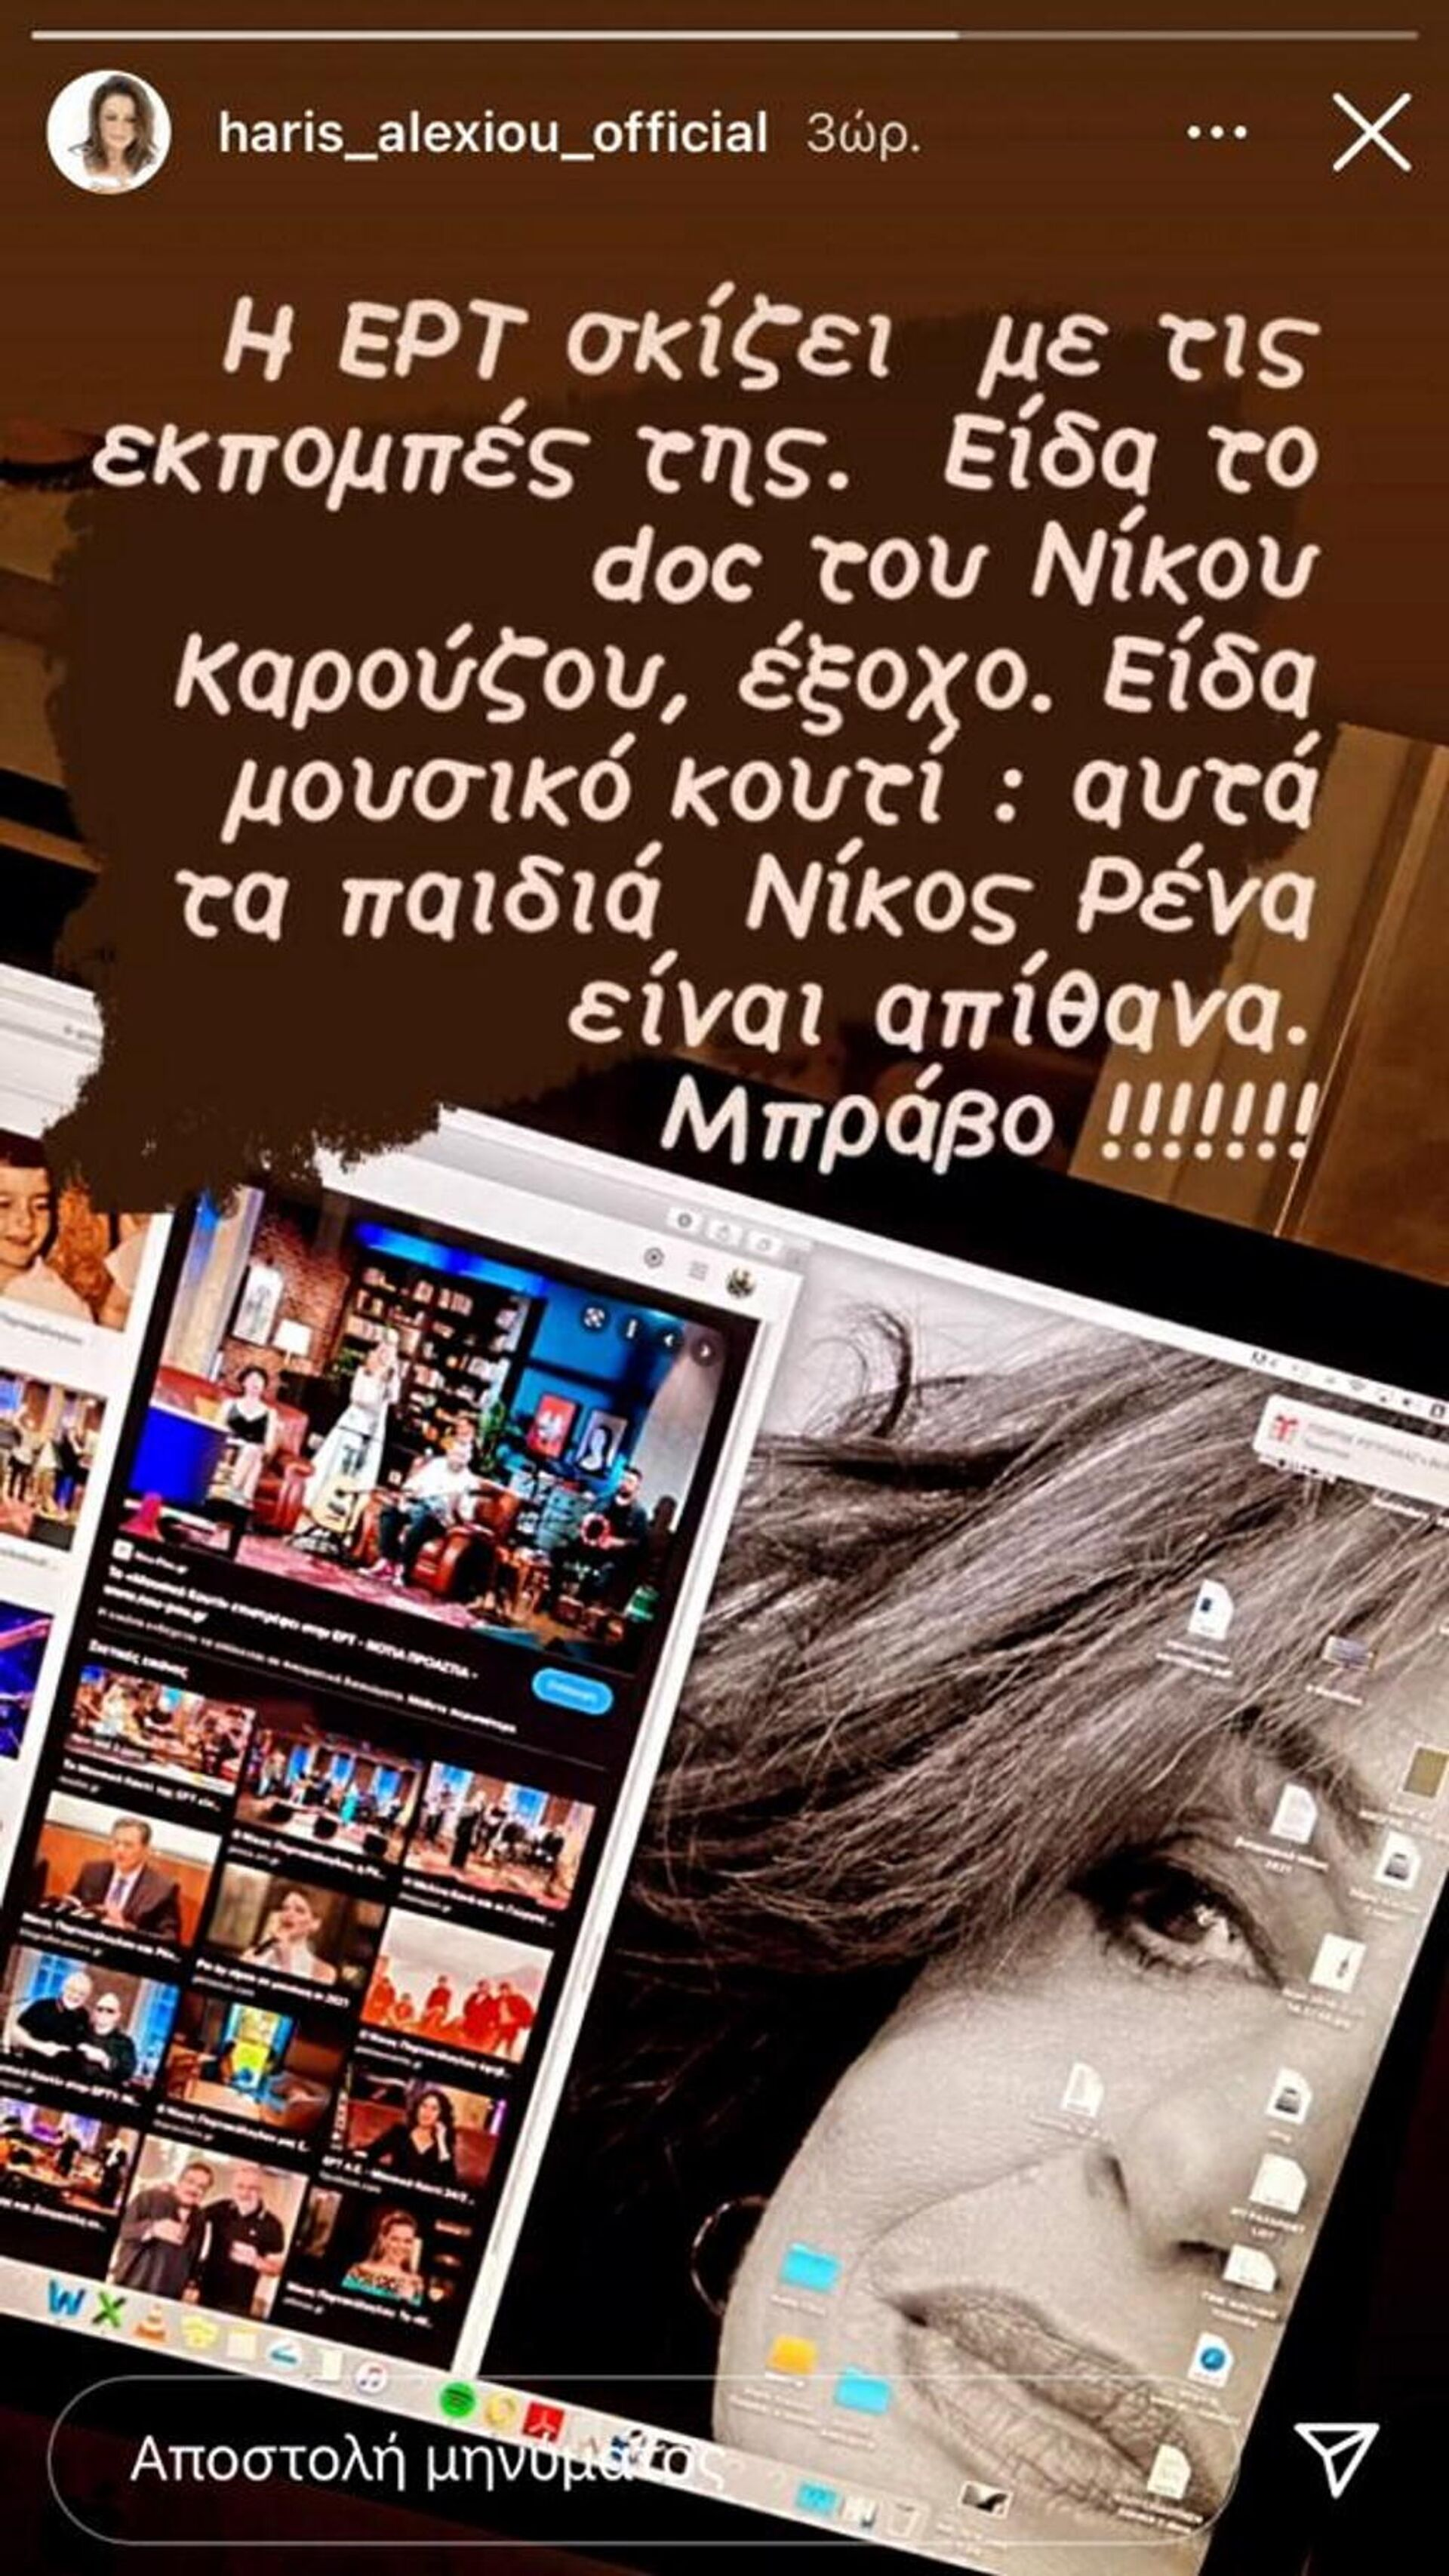 Instagram Story της Χαρούλας Αλεξίου για την ΕΡΤ, 30 Σεπτεμβρίου 2021 - Sputnik Ελλάδα, 1920, 30.09.2021